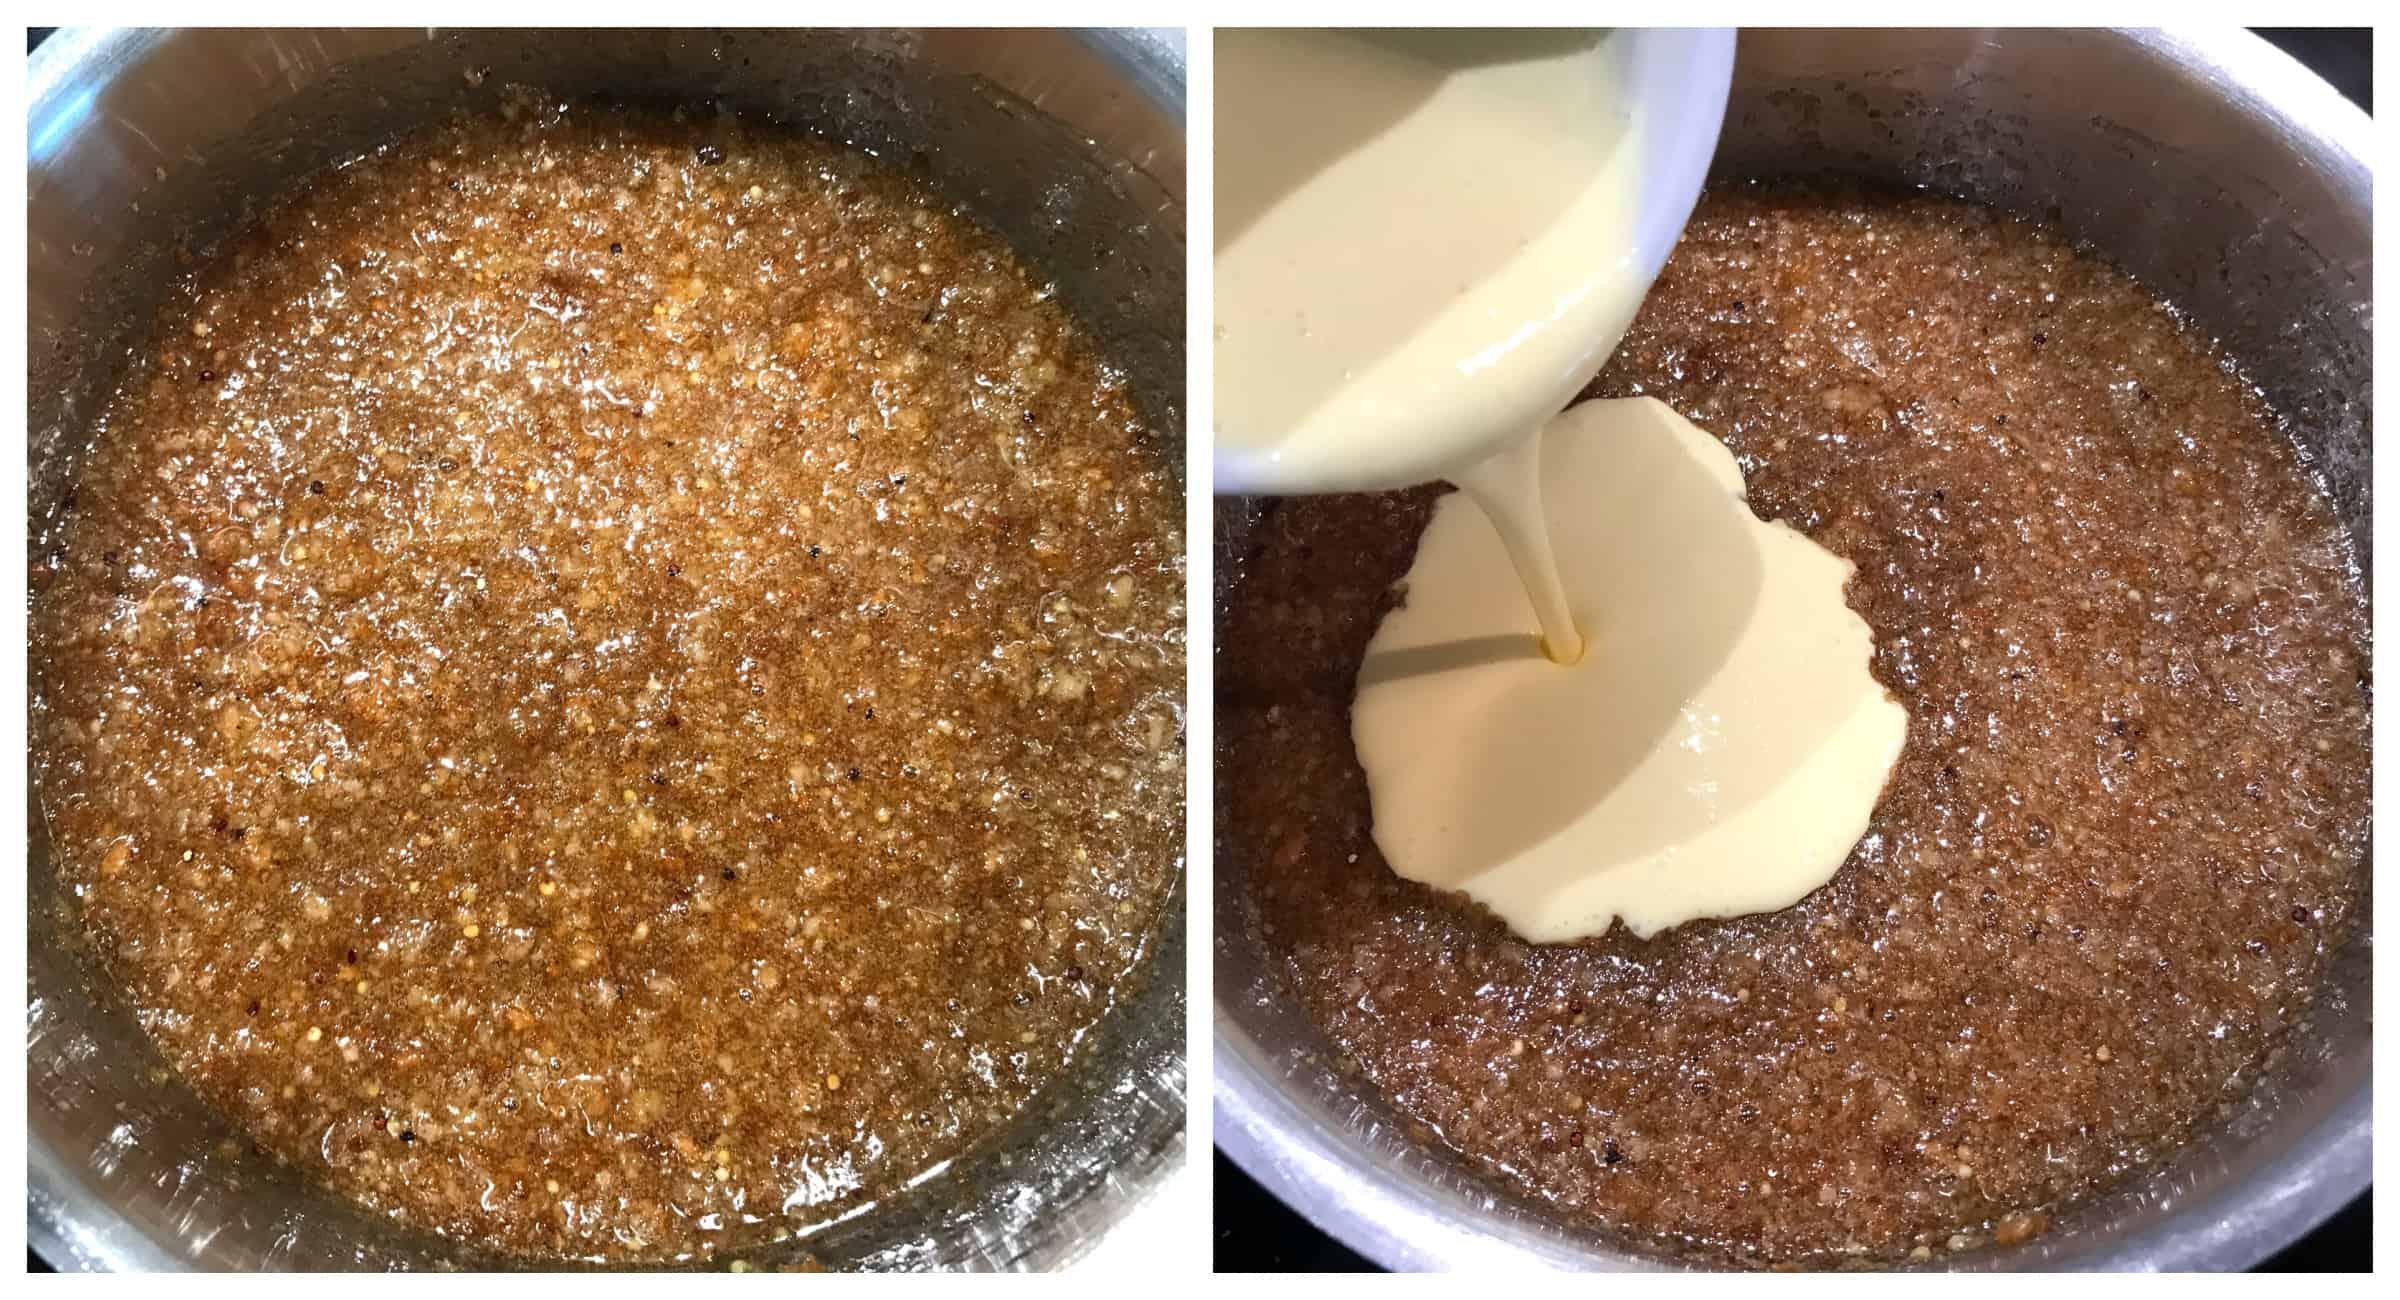 stir cream mixture into saucepan